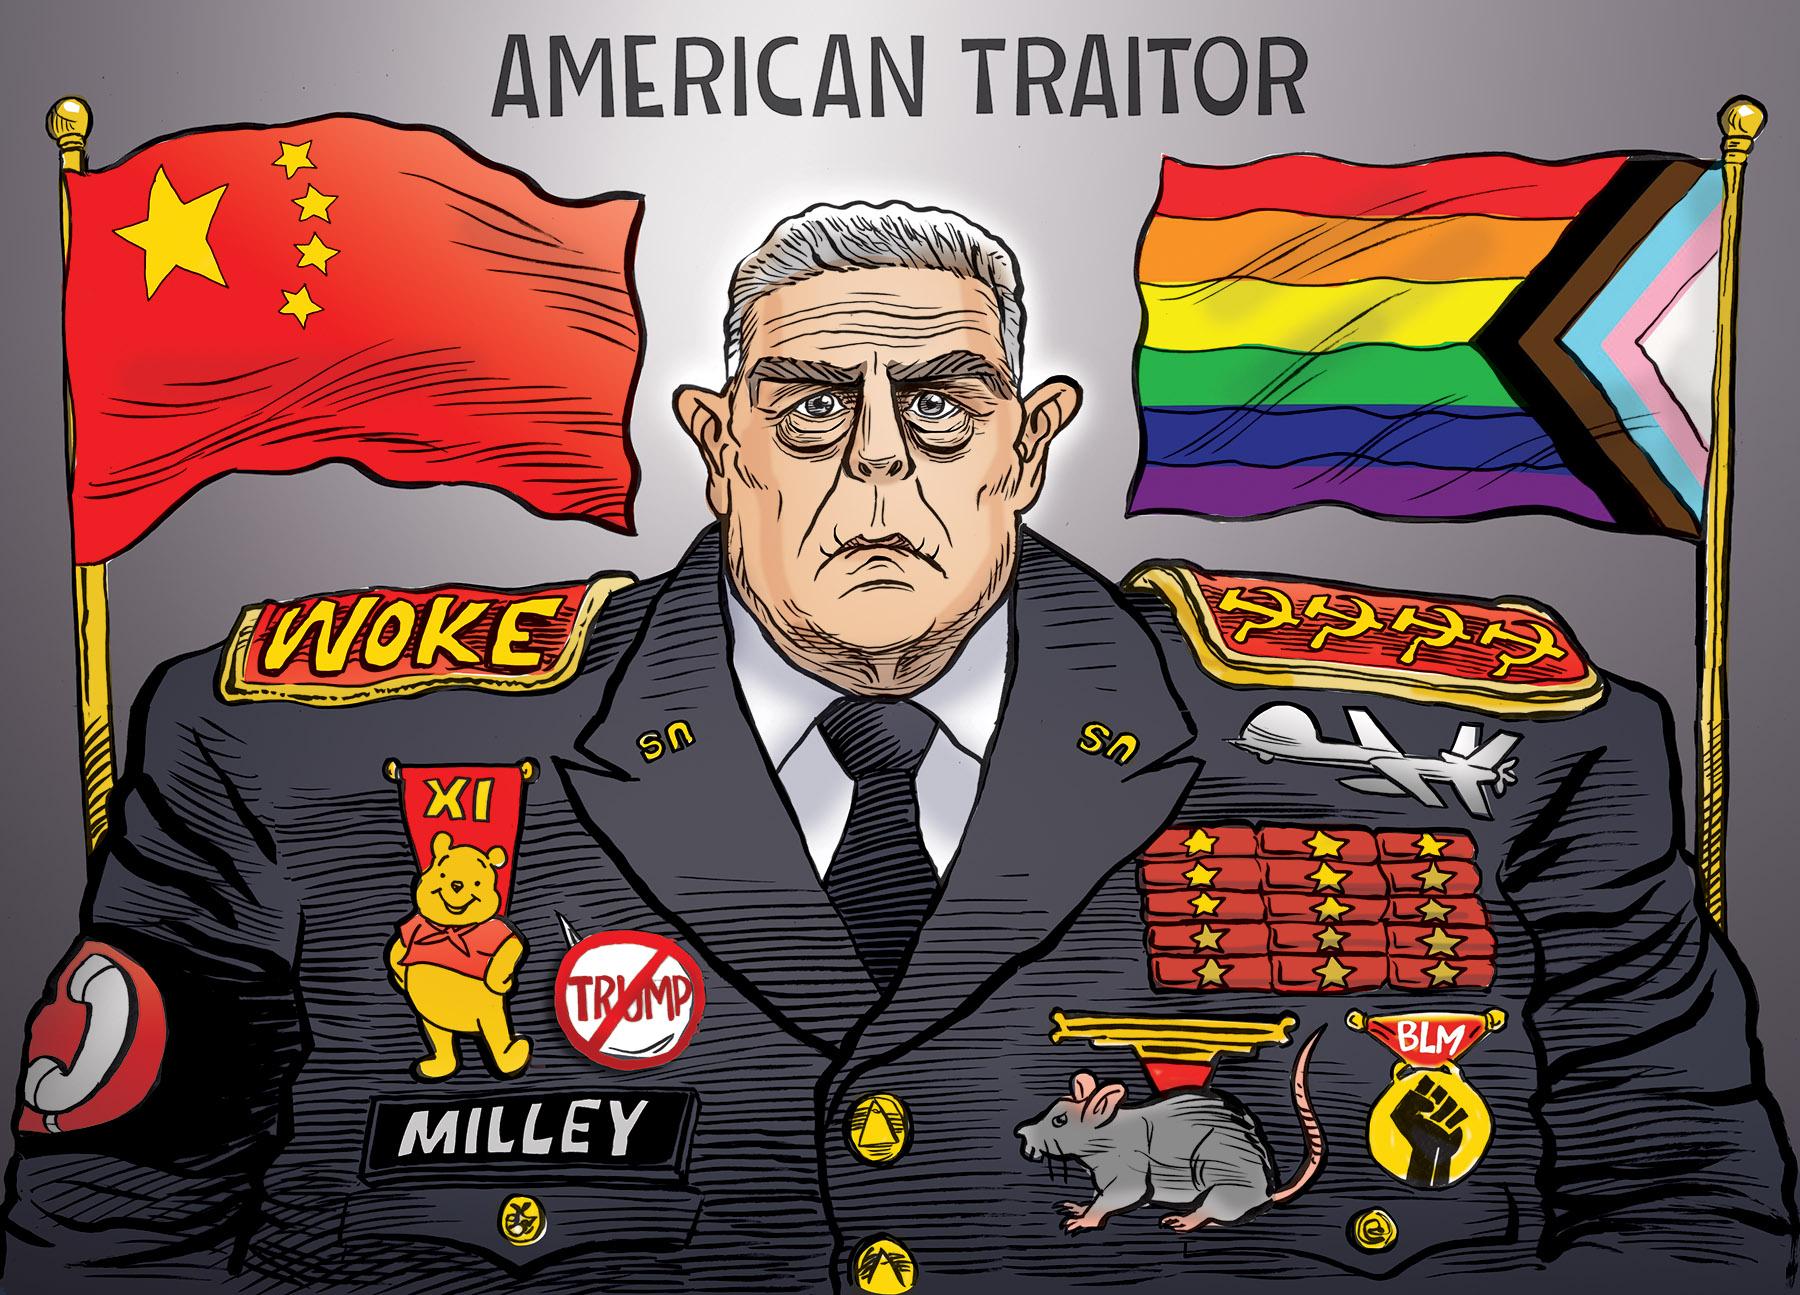 https://grrrgraphics.com/wp-content/uploads/2021/09/milley-traitor.jpg